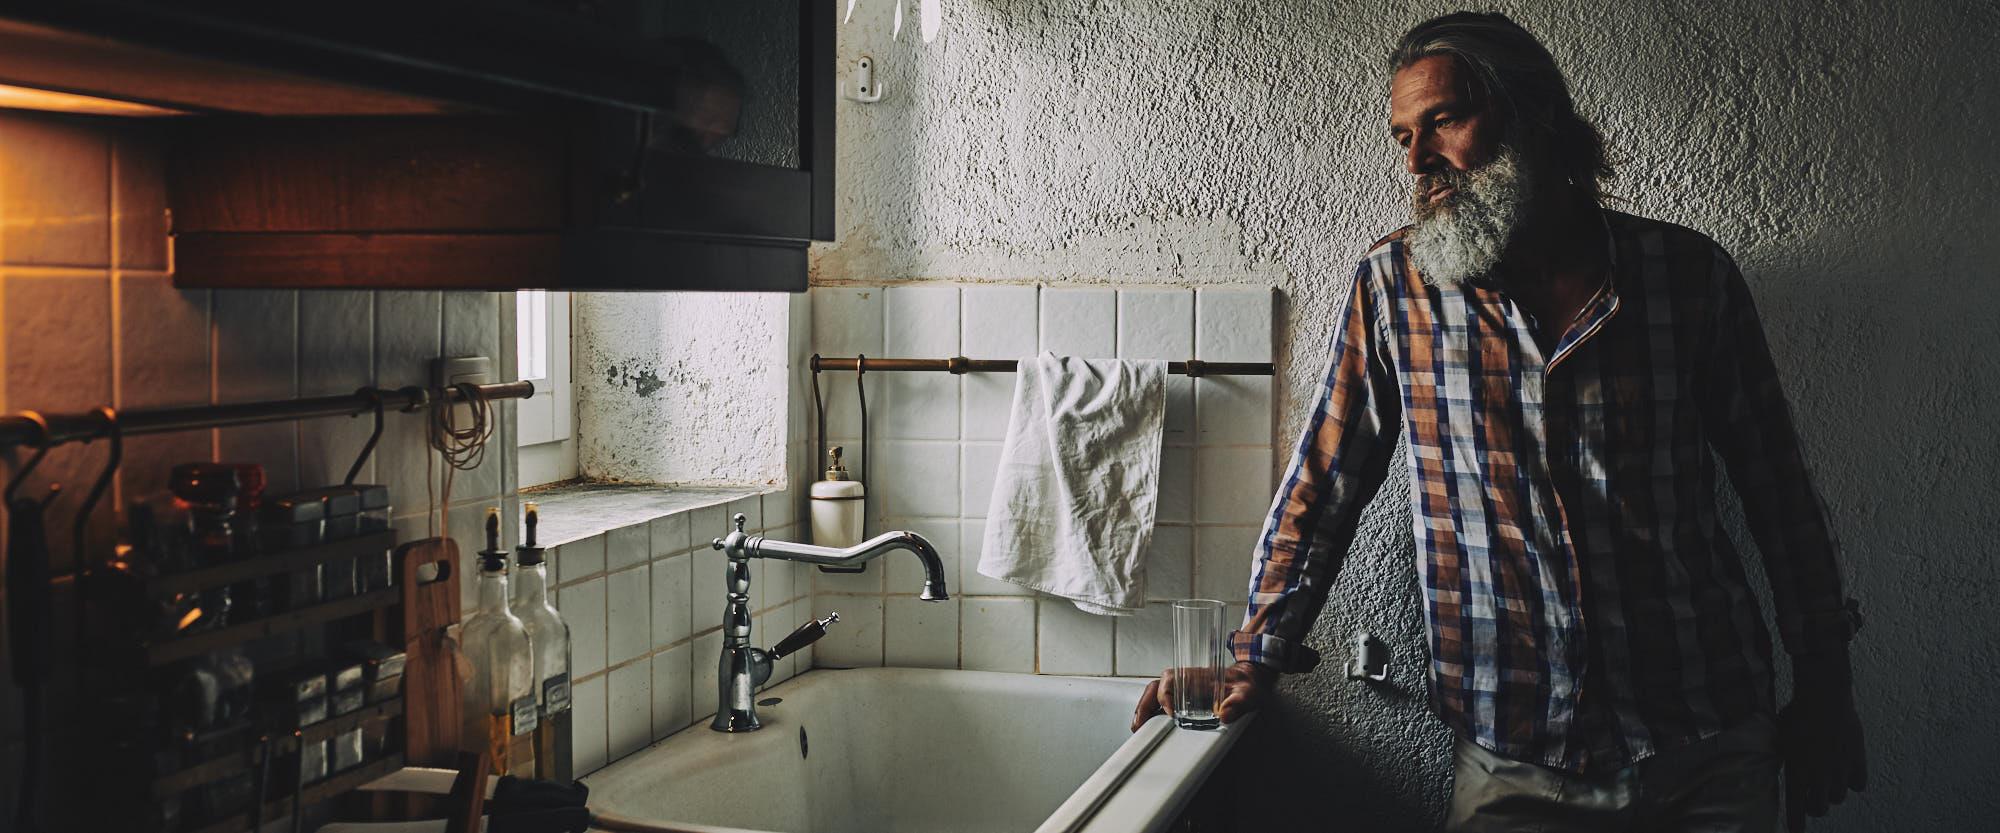 London Lifestyle advertising Photographer Matthew Lloyd for Coca Cola0915.jpg